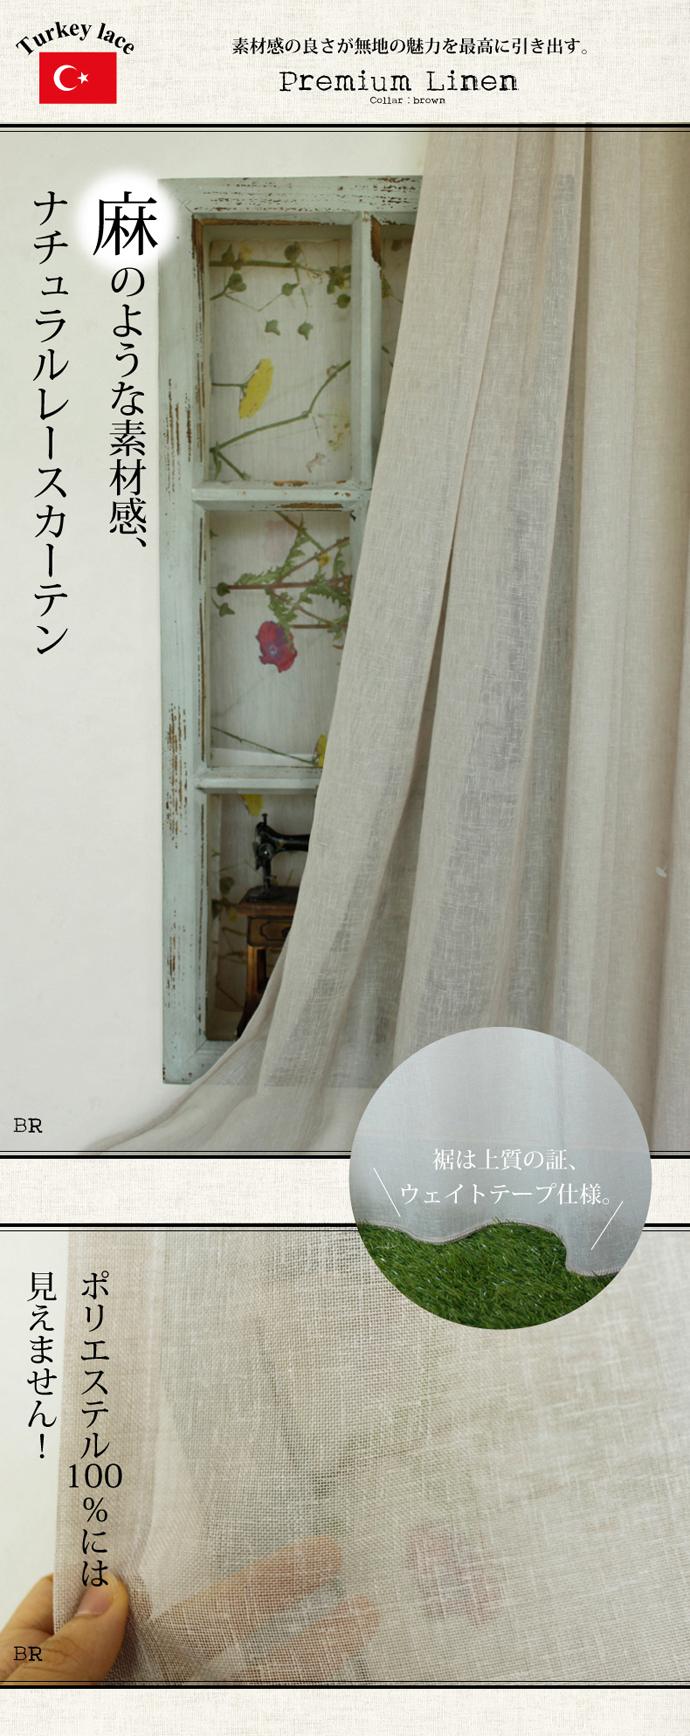 Premium linen・トルコレース